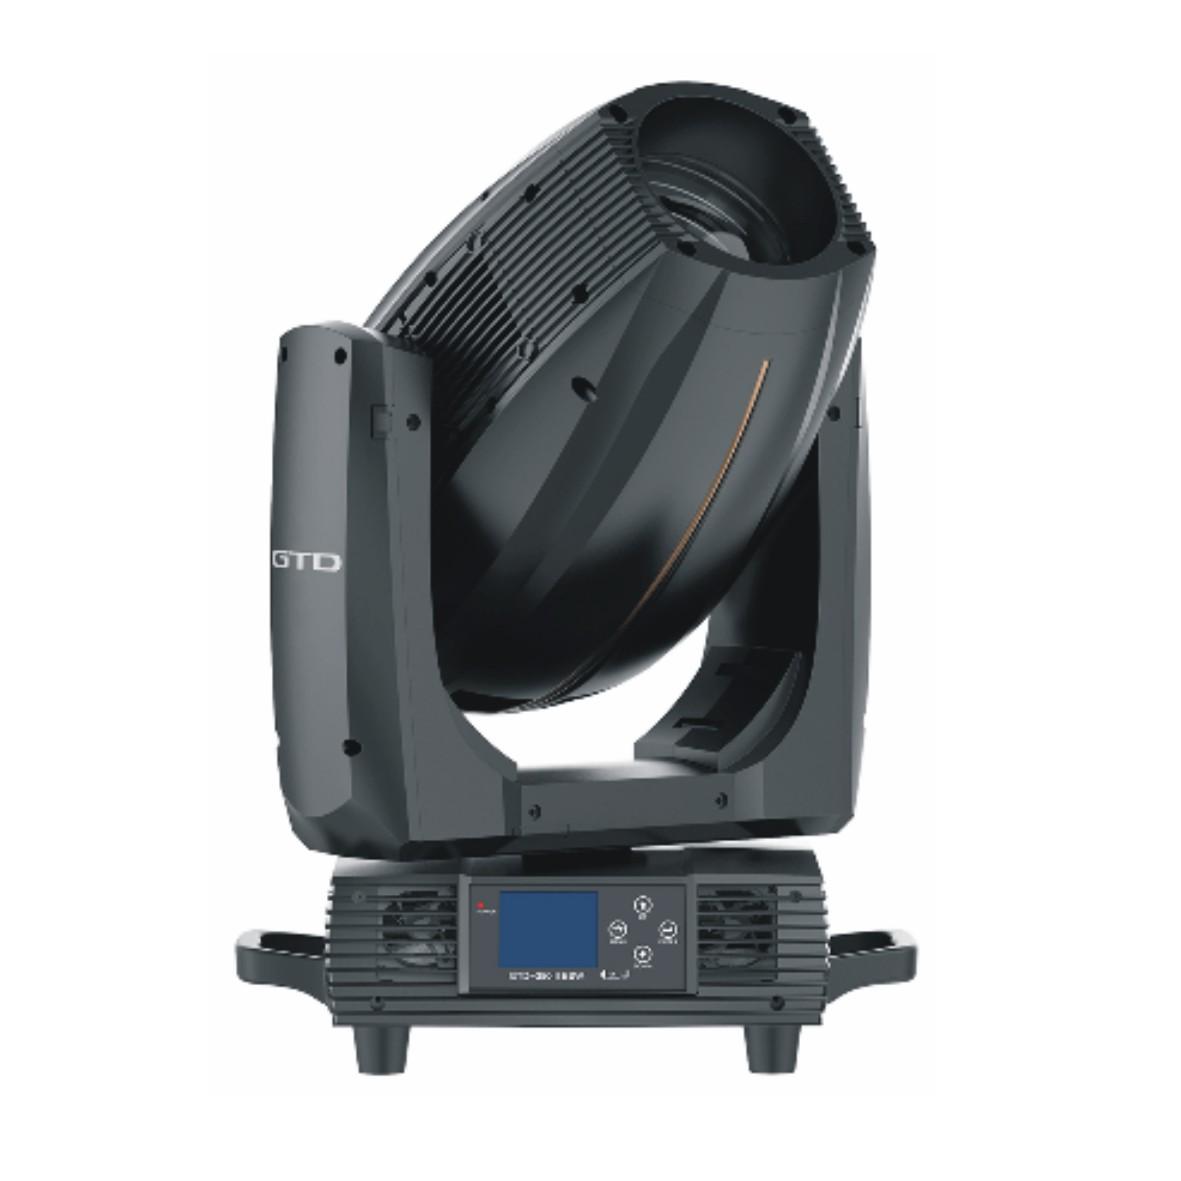 GTD-380 II BSW 电脑摇头灯(三合一)